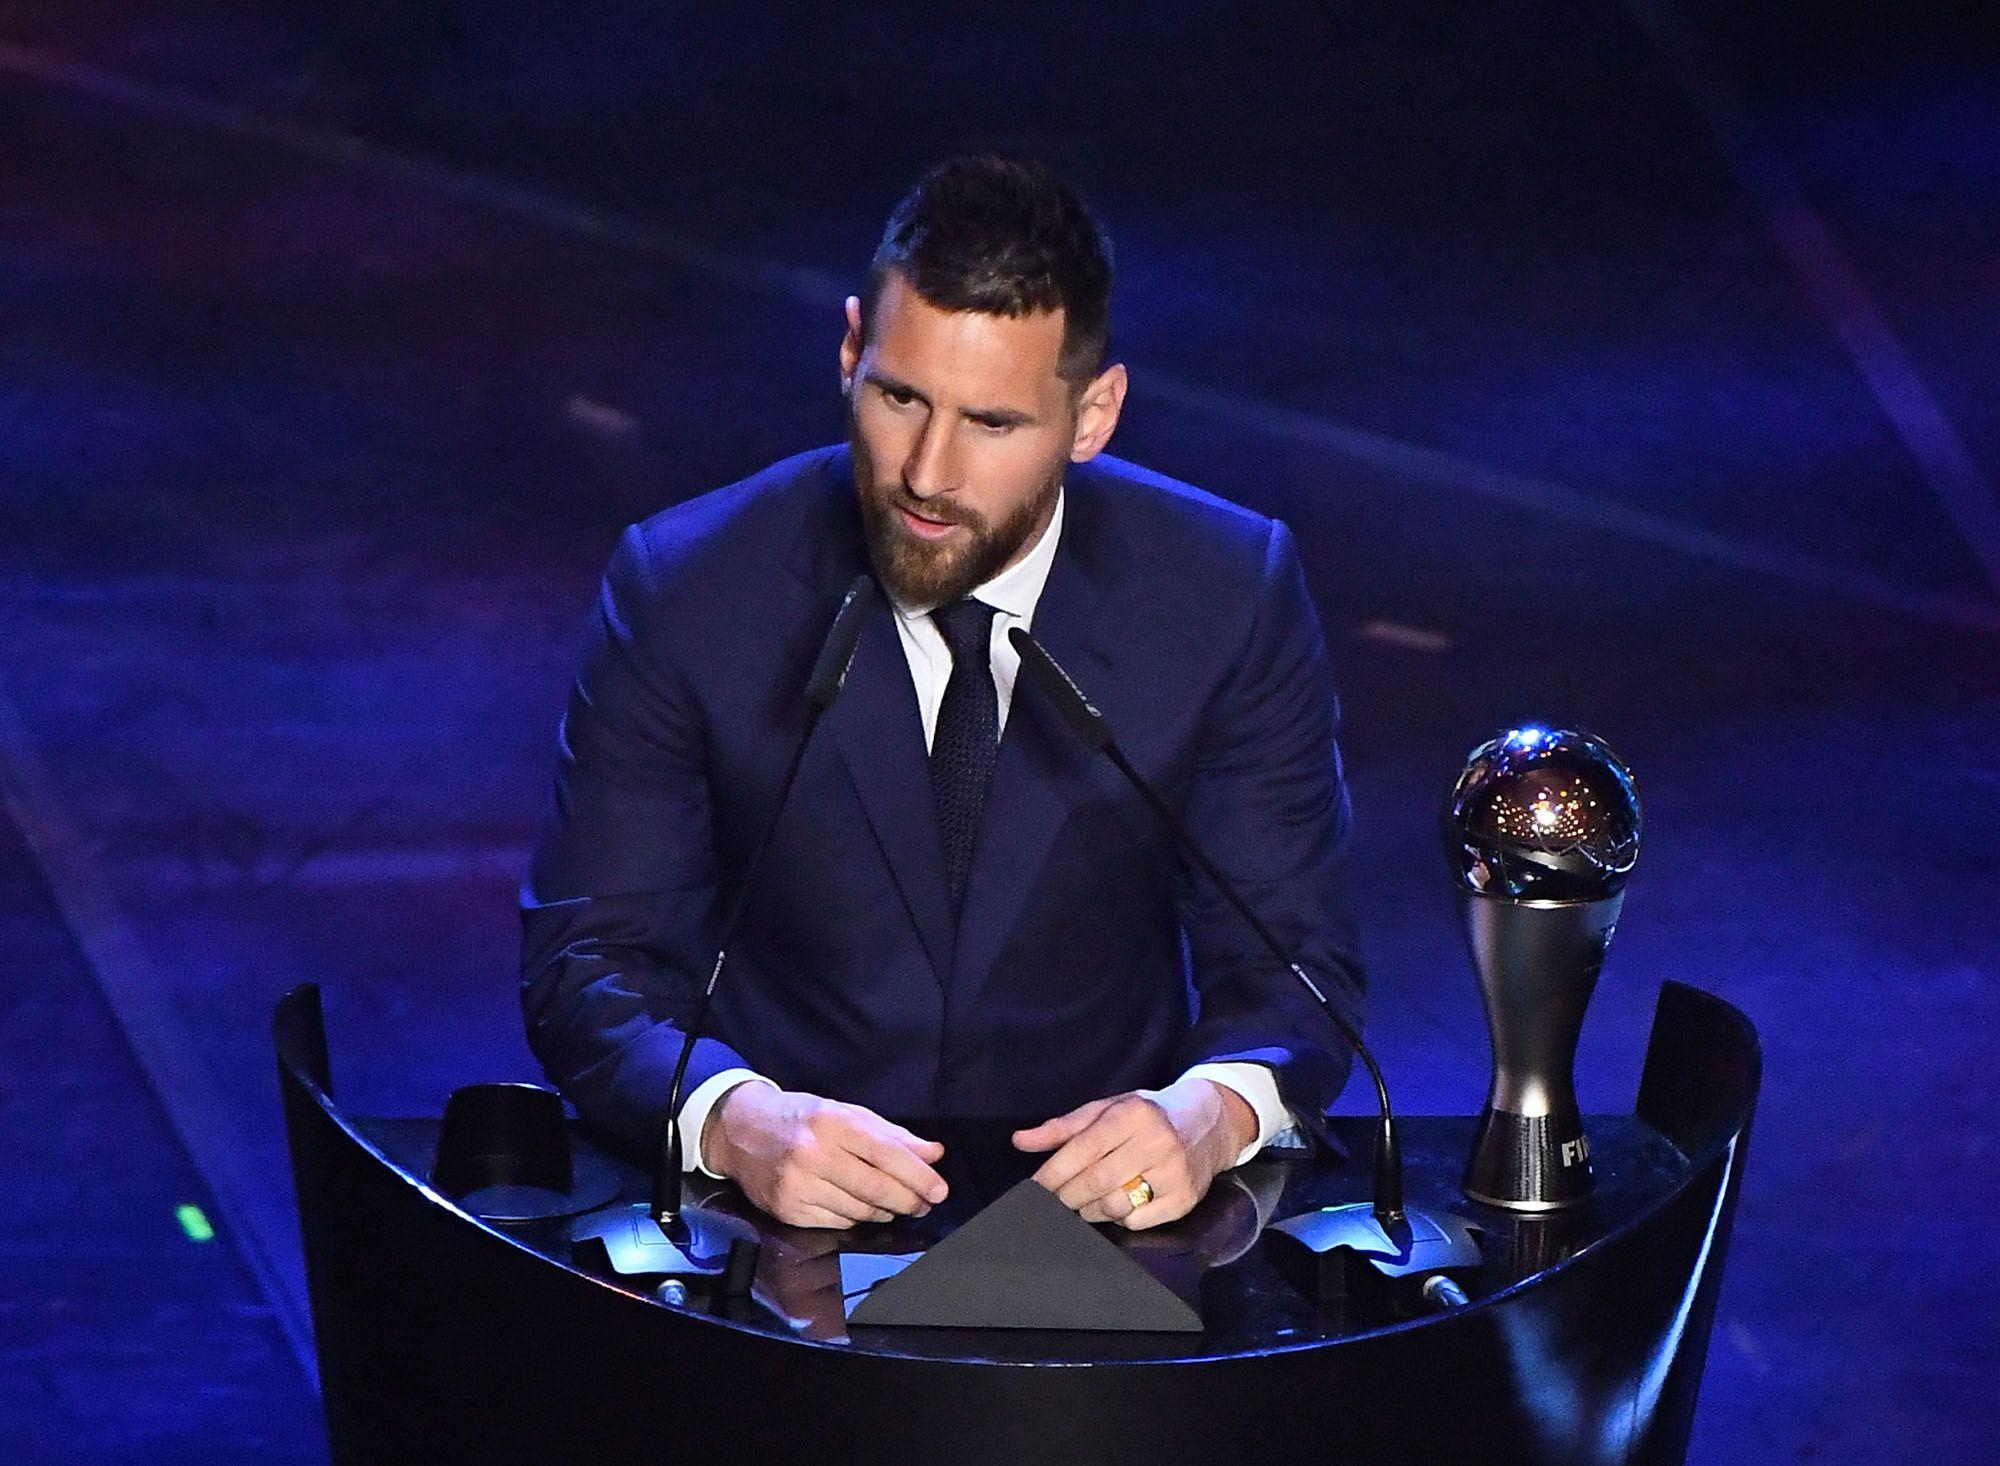 El lunes, Messi se llevó el premio The Best a mejor futbolista del mundo (Reuters)